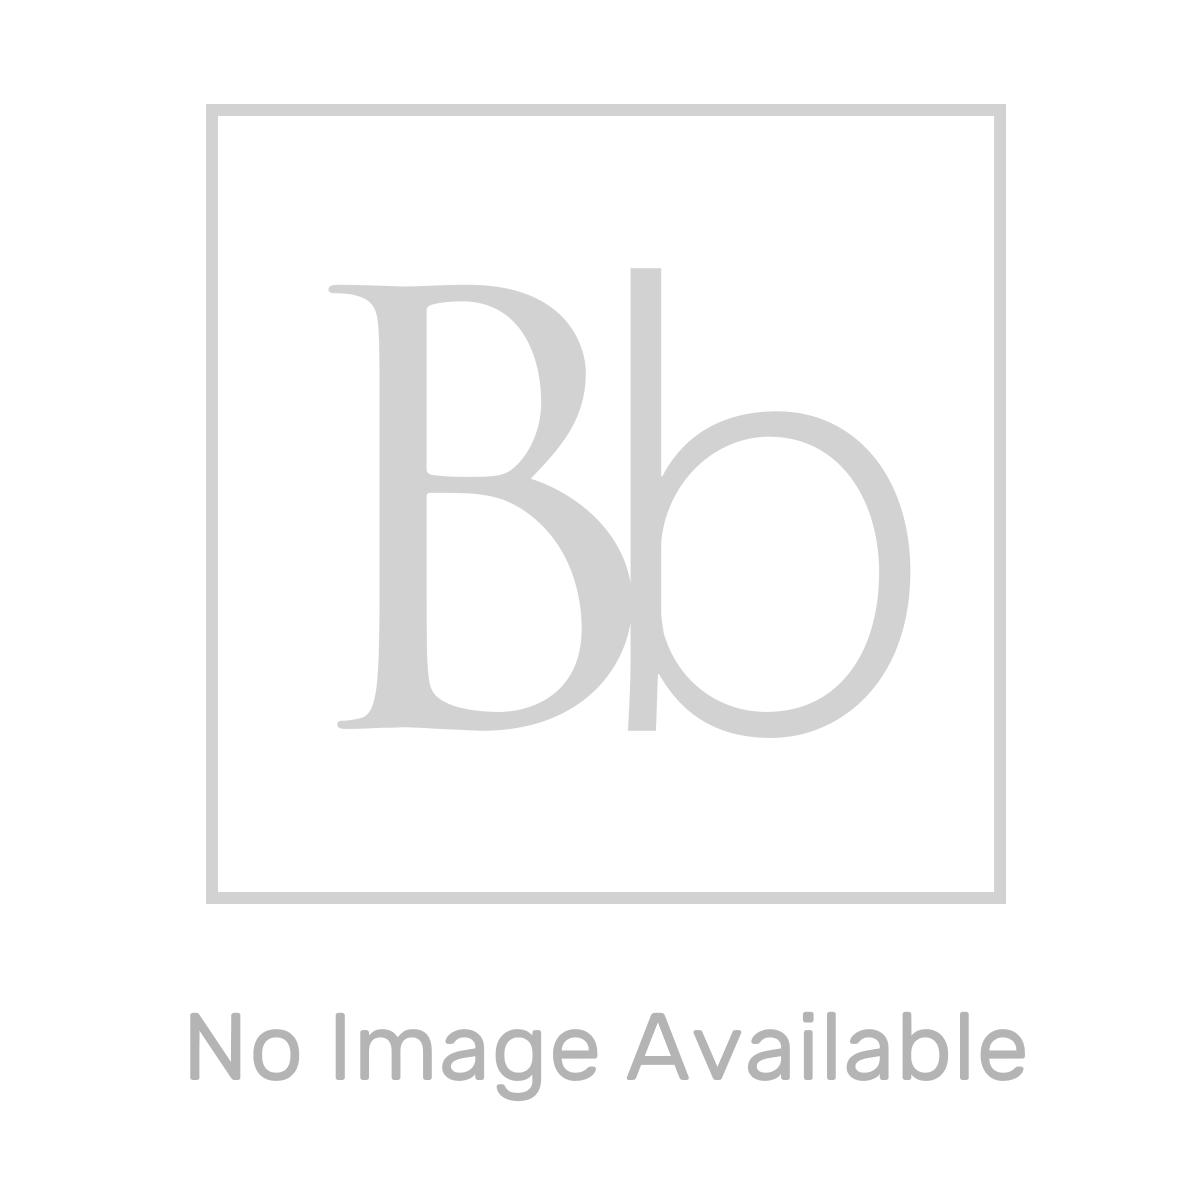 RAK Moon Oval Counter Top Basin 550mm Measurements